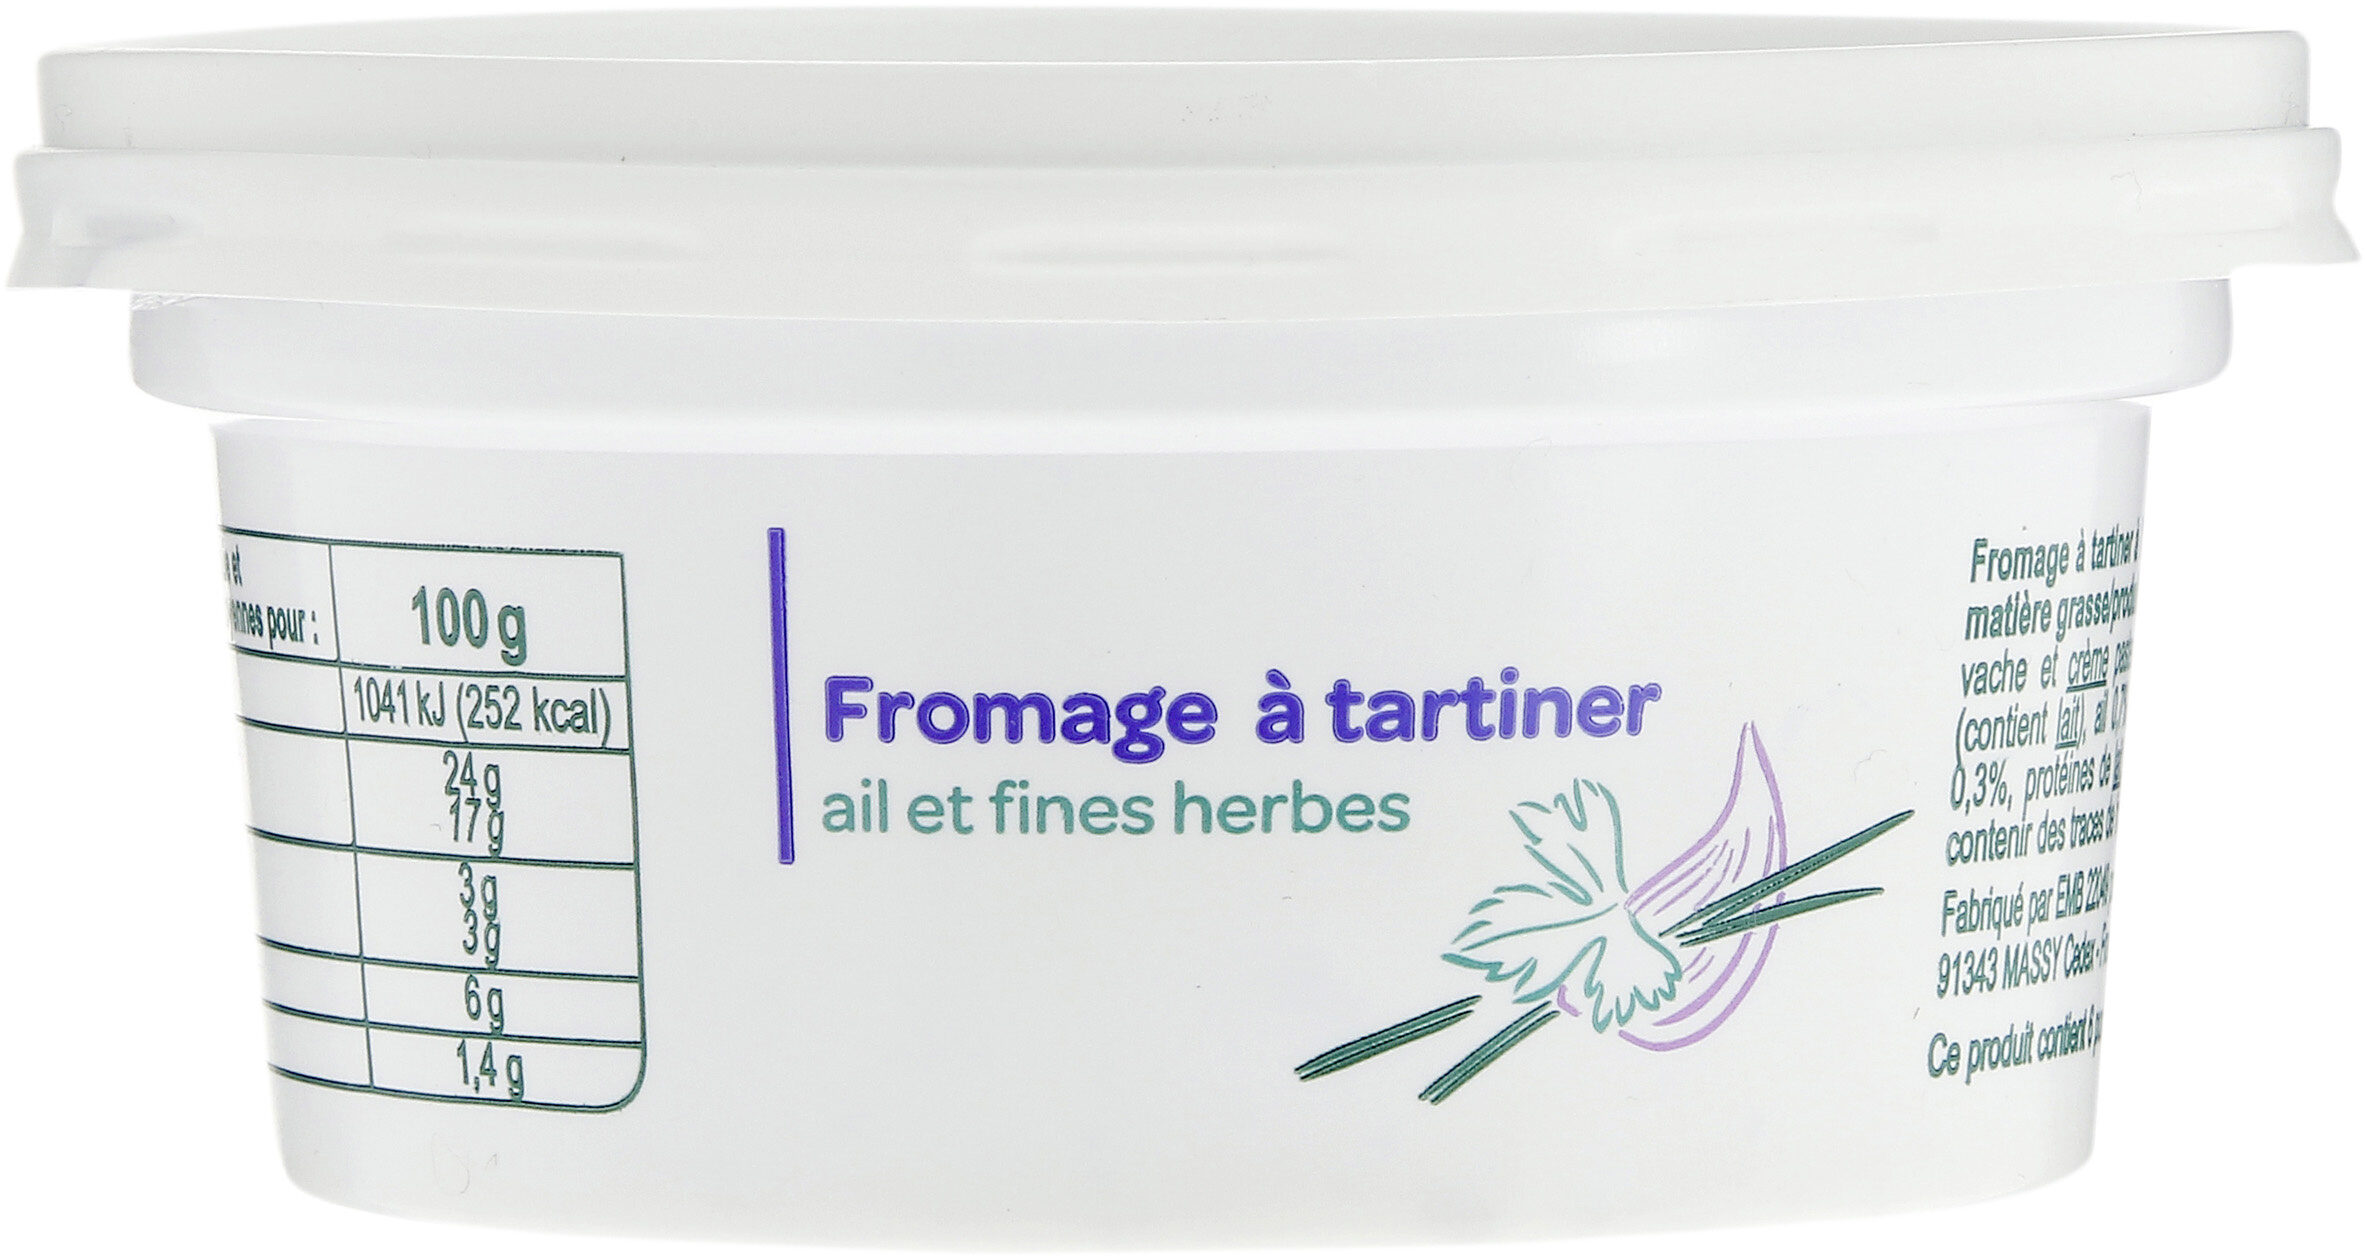 Fromage à tartiner, ail et fines herbes (24 % MG) - Produit - fr